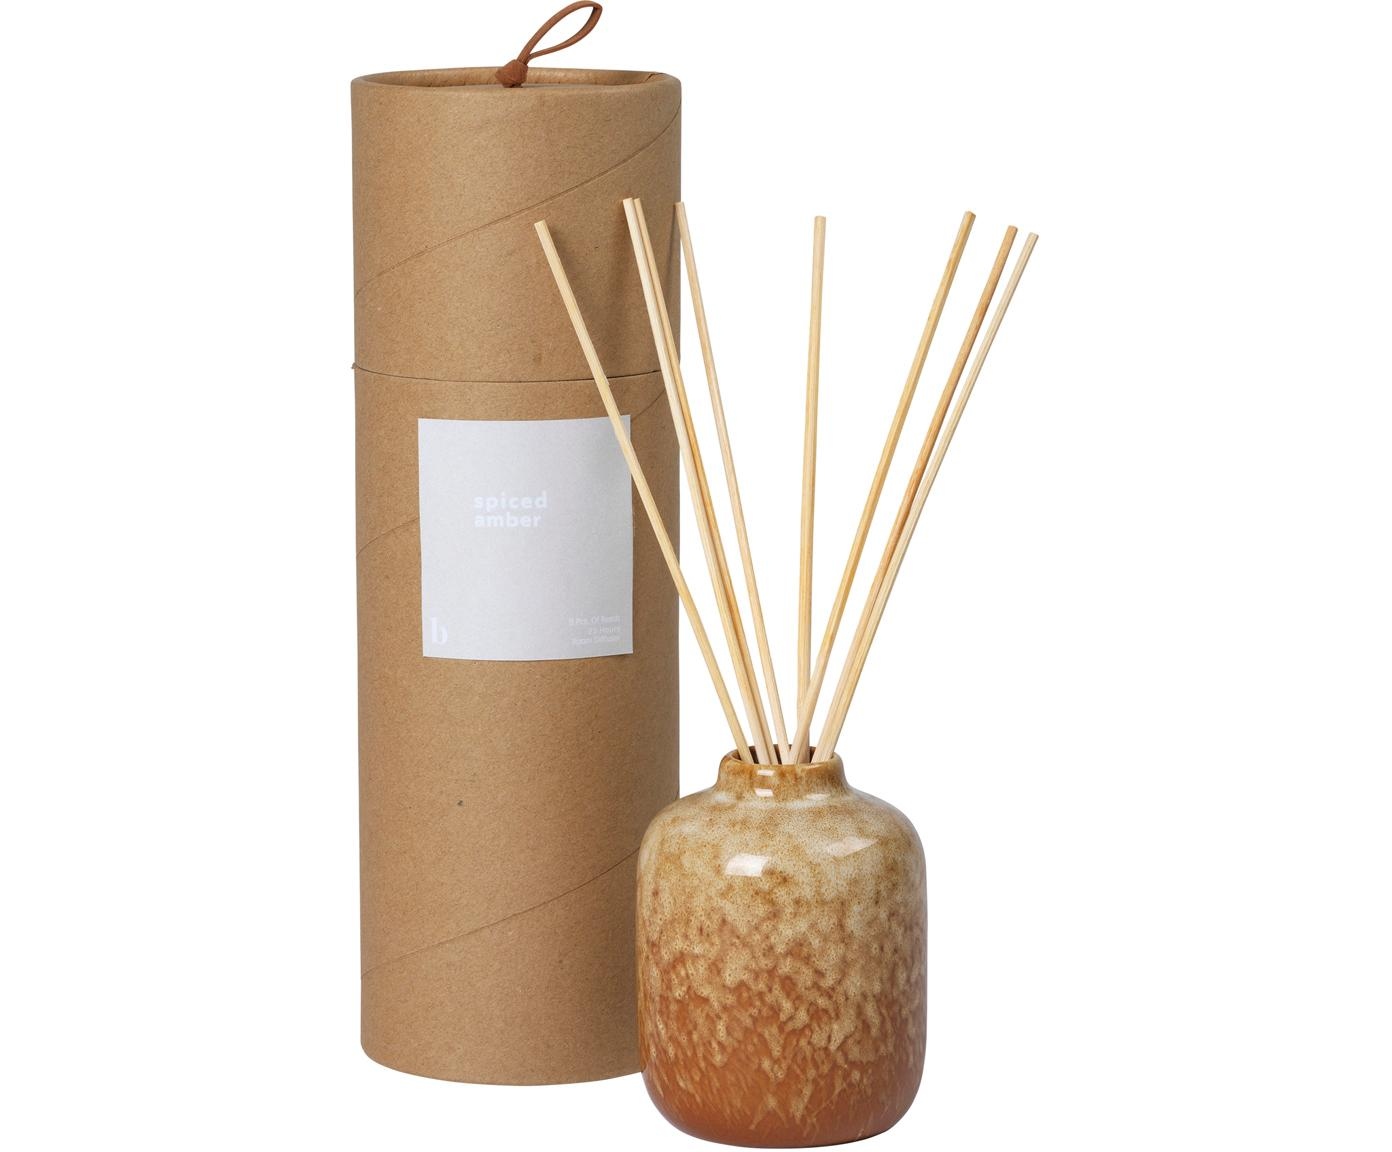 Diffuser Spiced Amber, Behälter: Keramik, Brauntöne, Ø 7 x H 9 cm